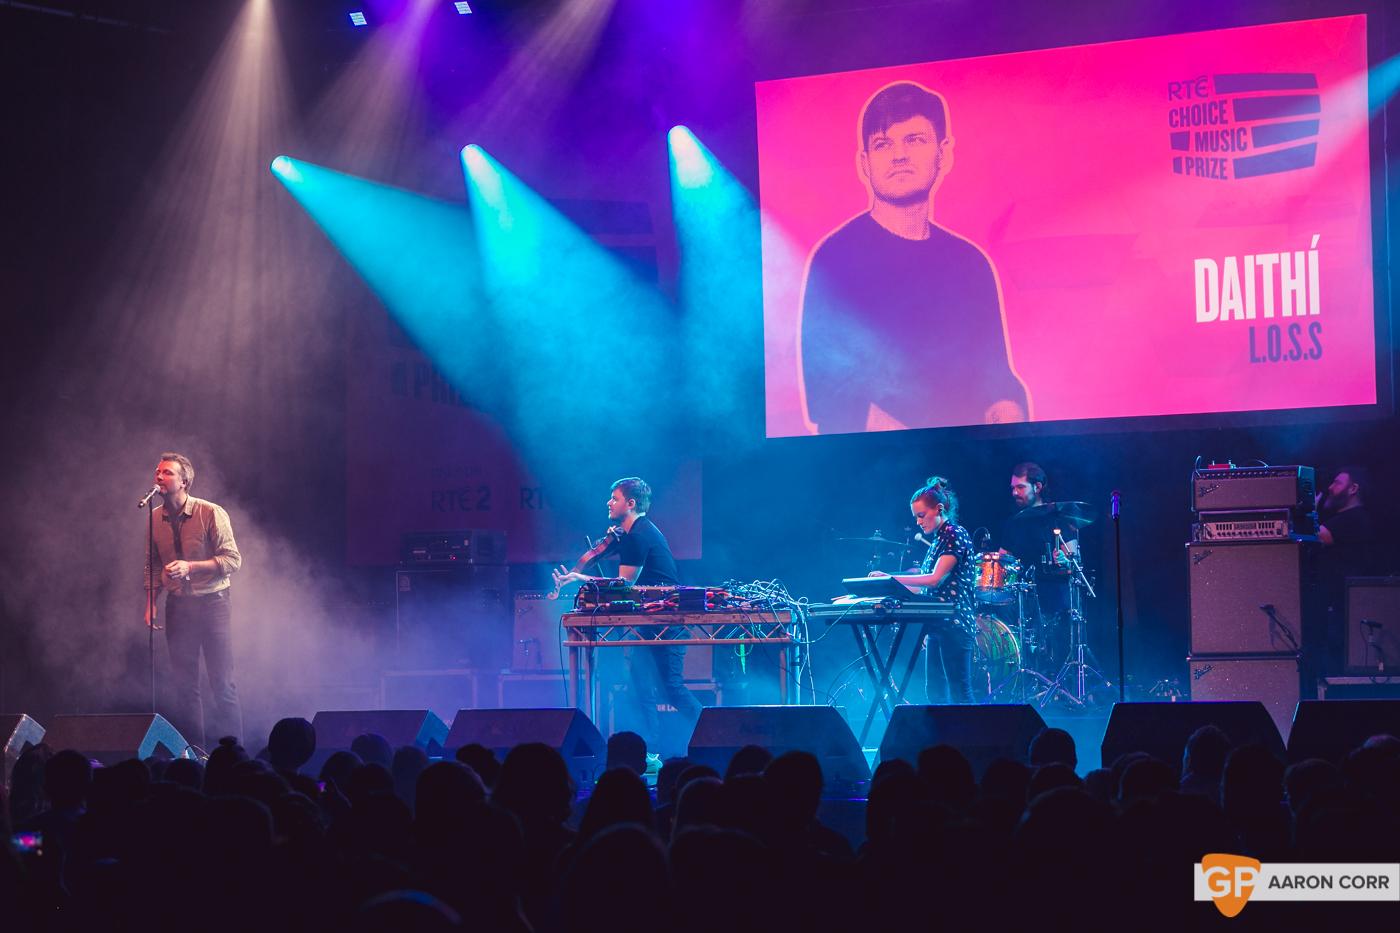 Daithi at Choice Music Prize 2020 in Vicar Street, Dublin on 05-Mar-20 by Aaron Corr-5327